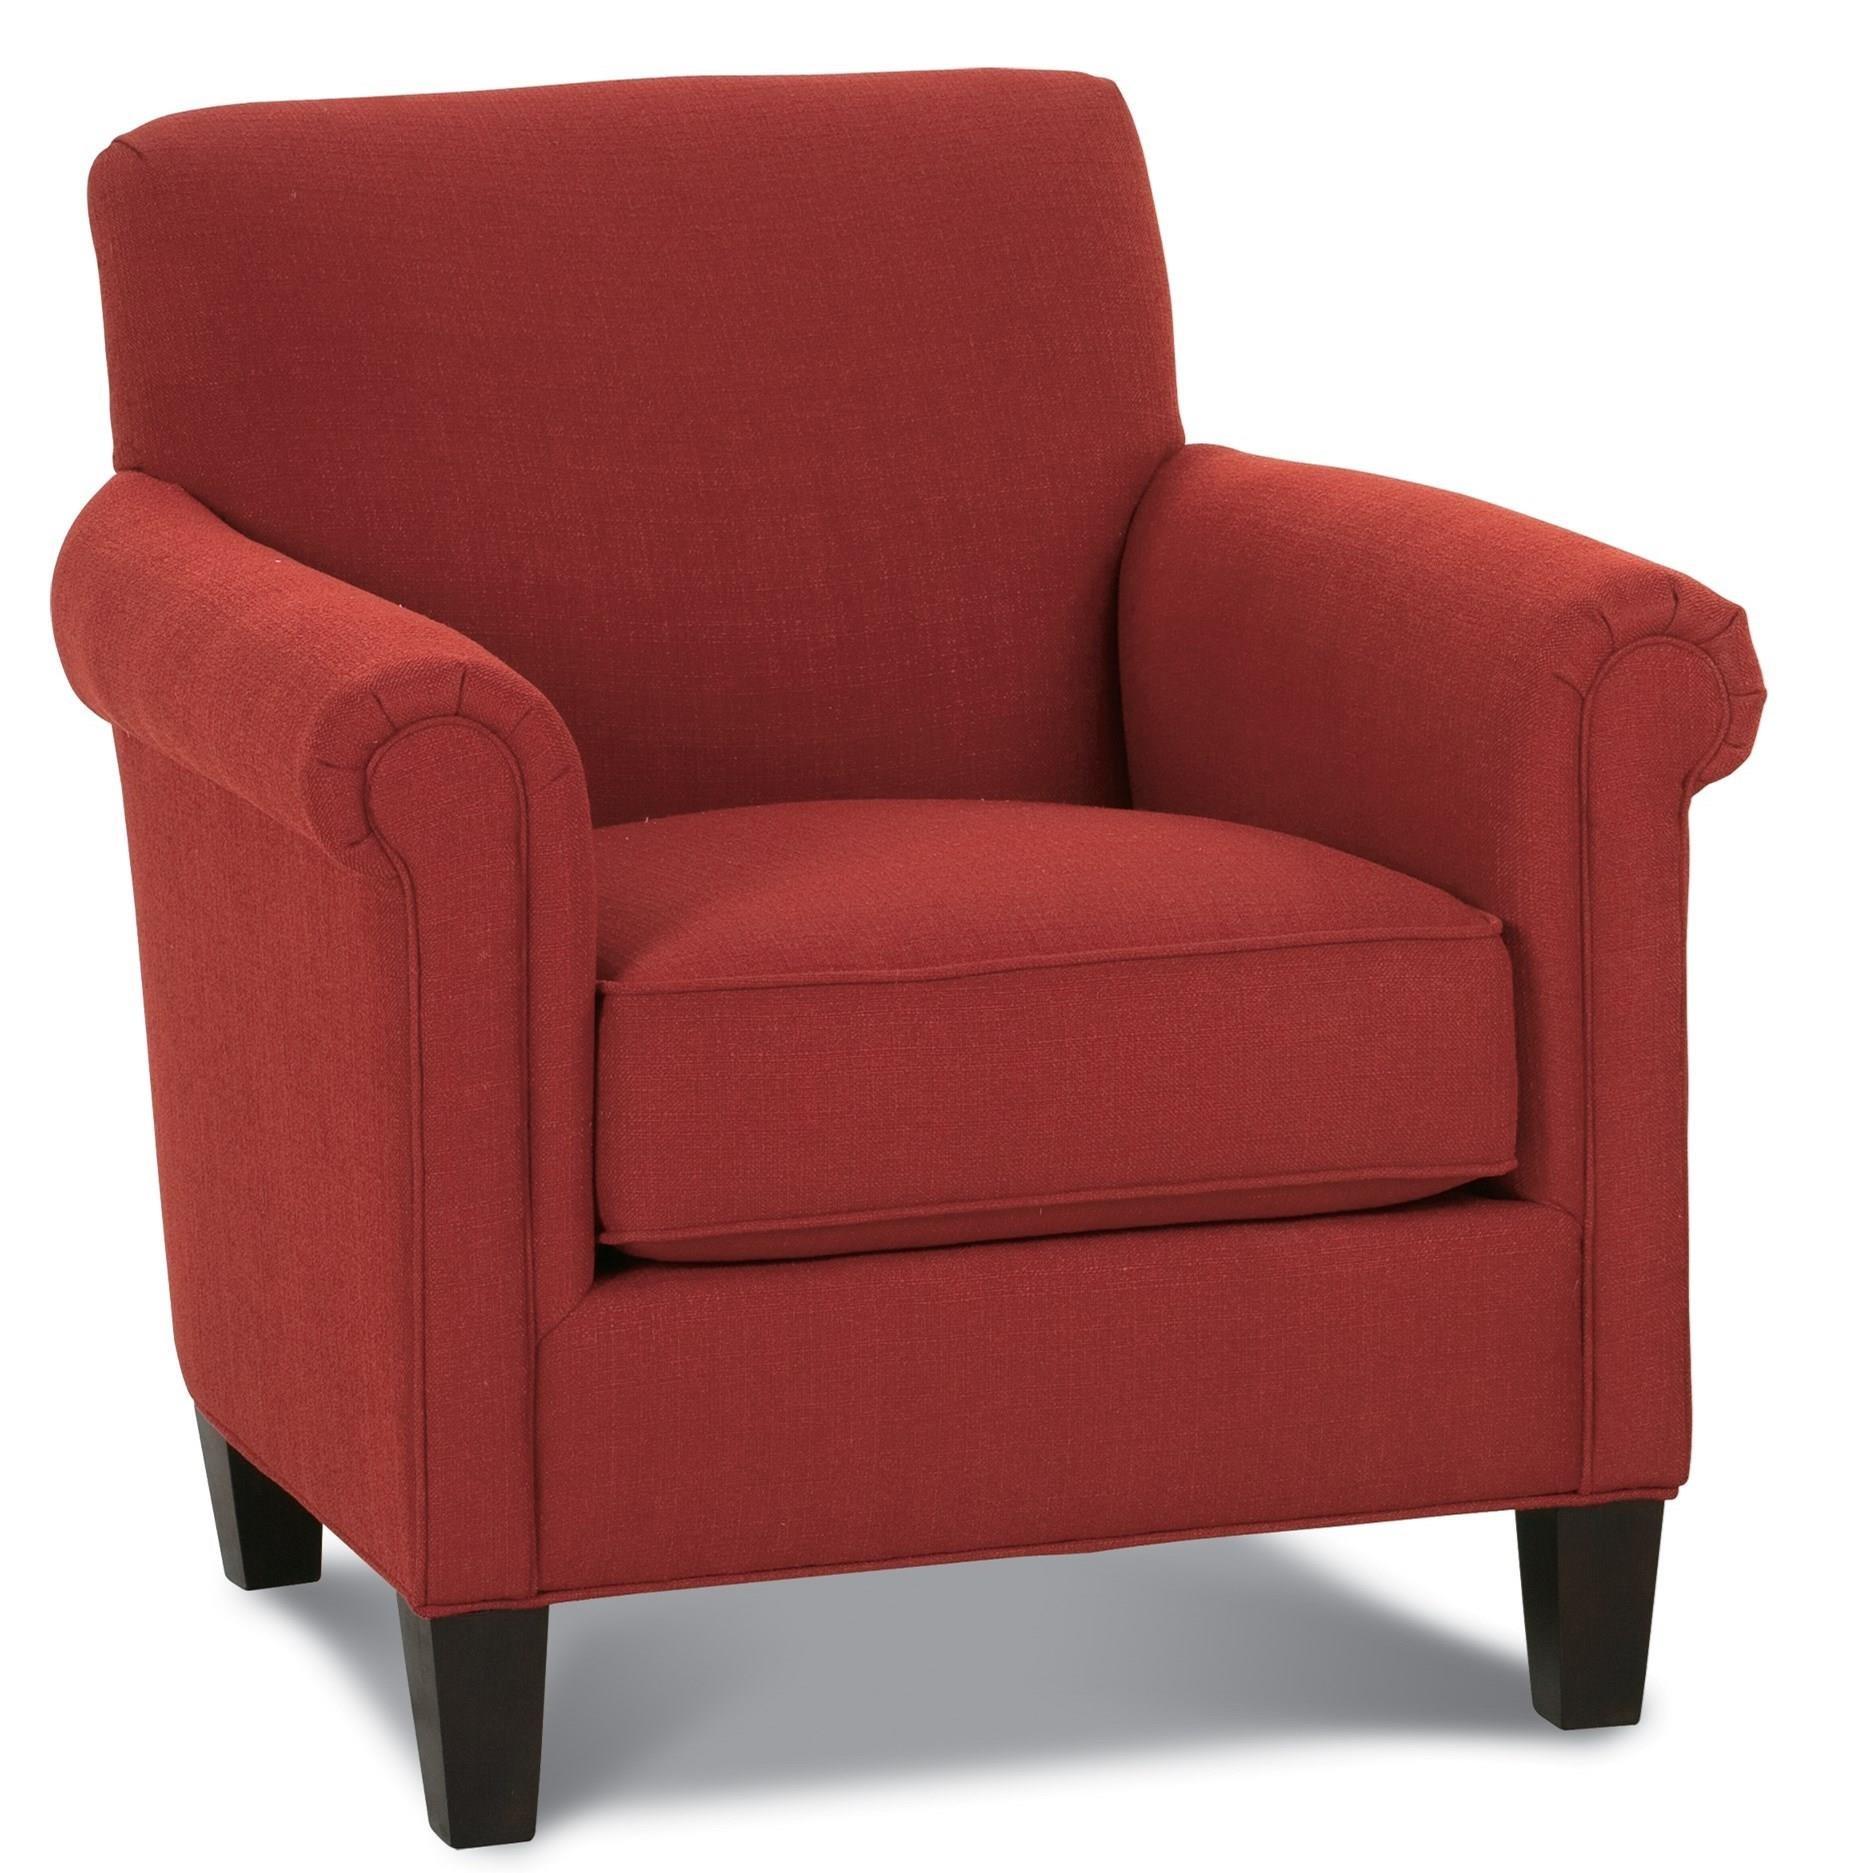 McGuire Arm Chair